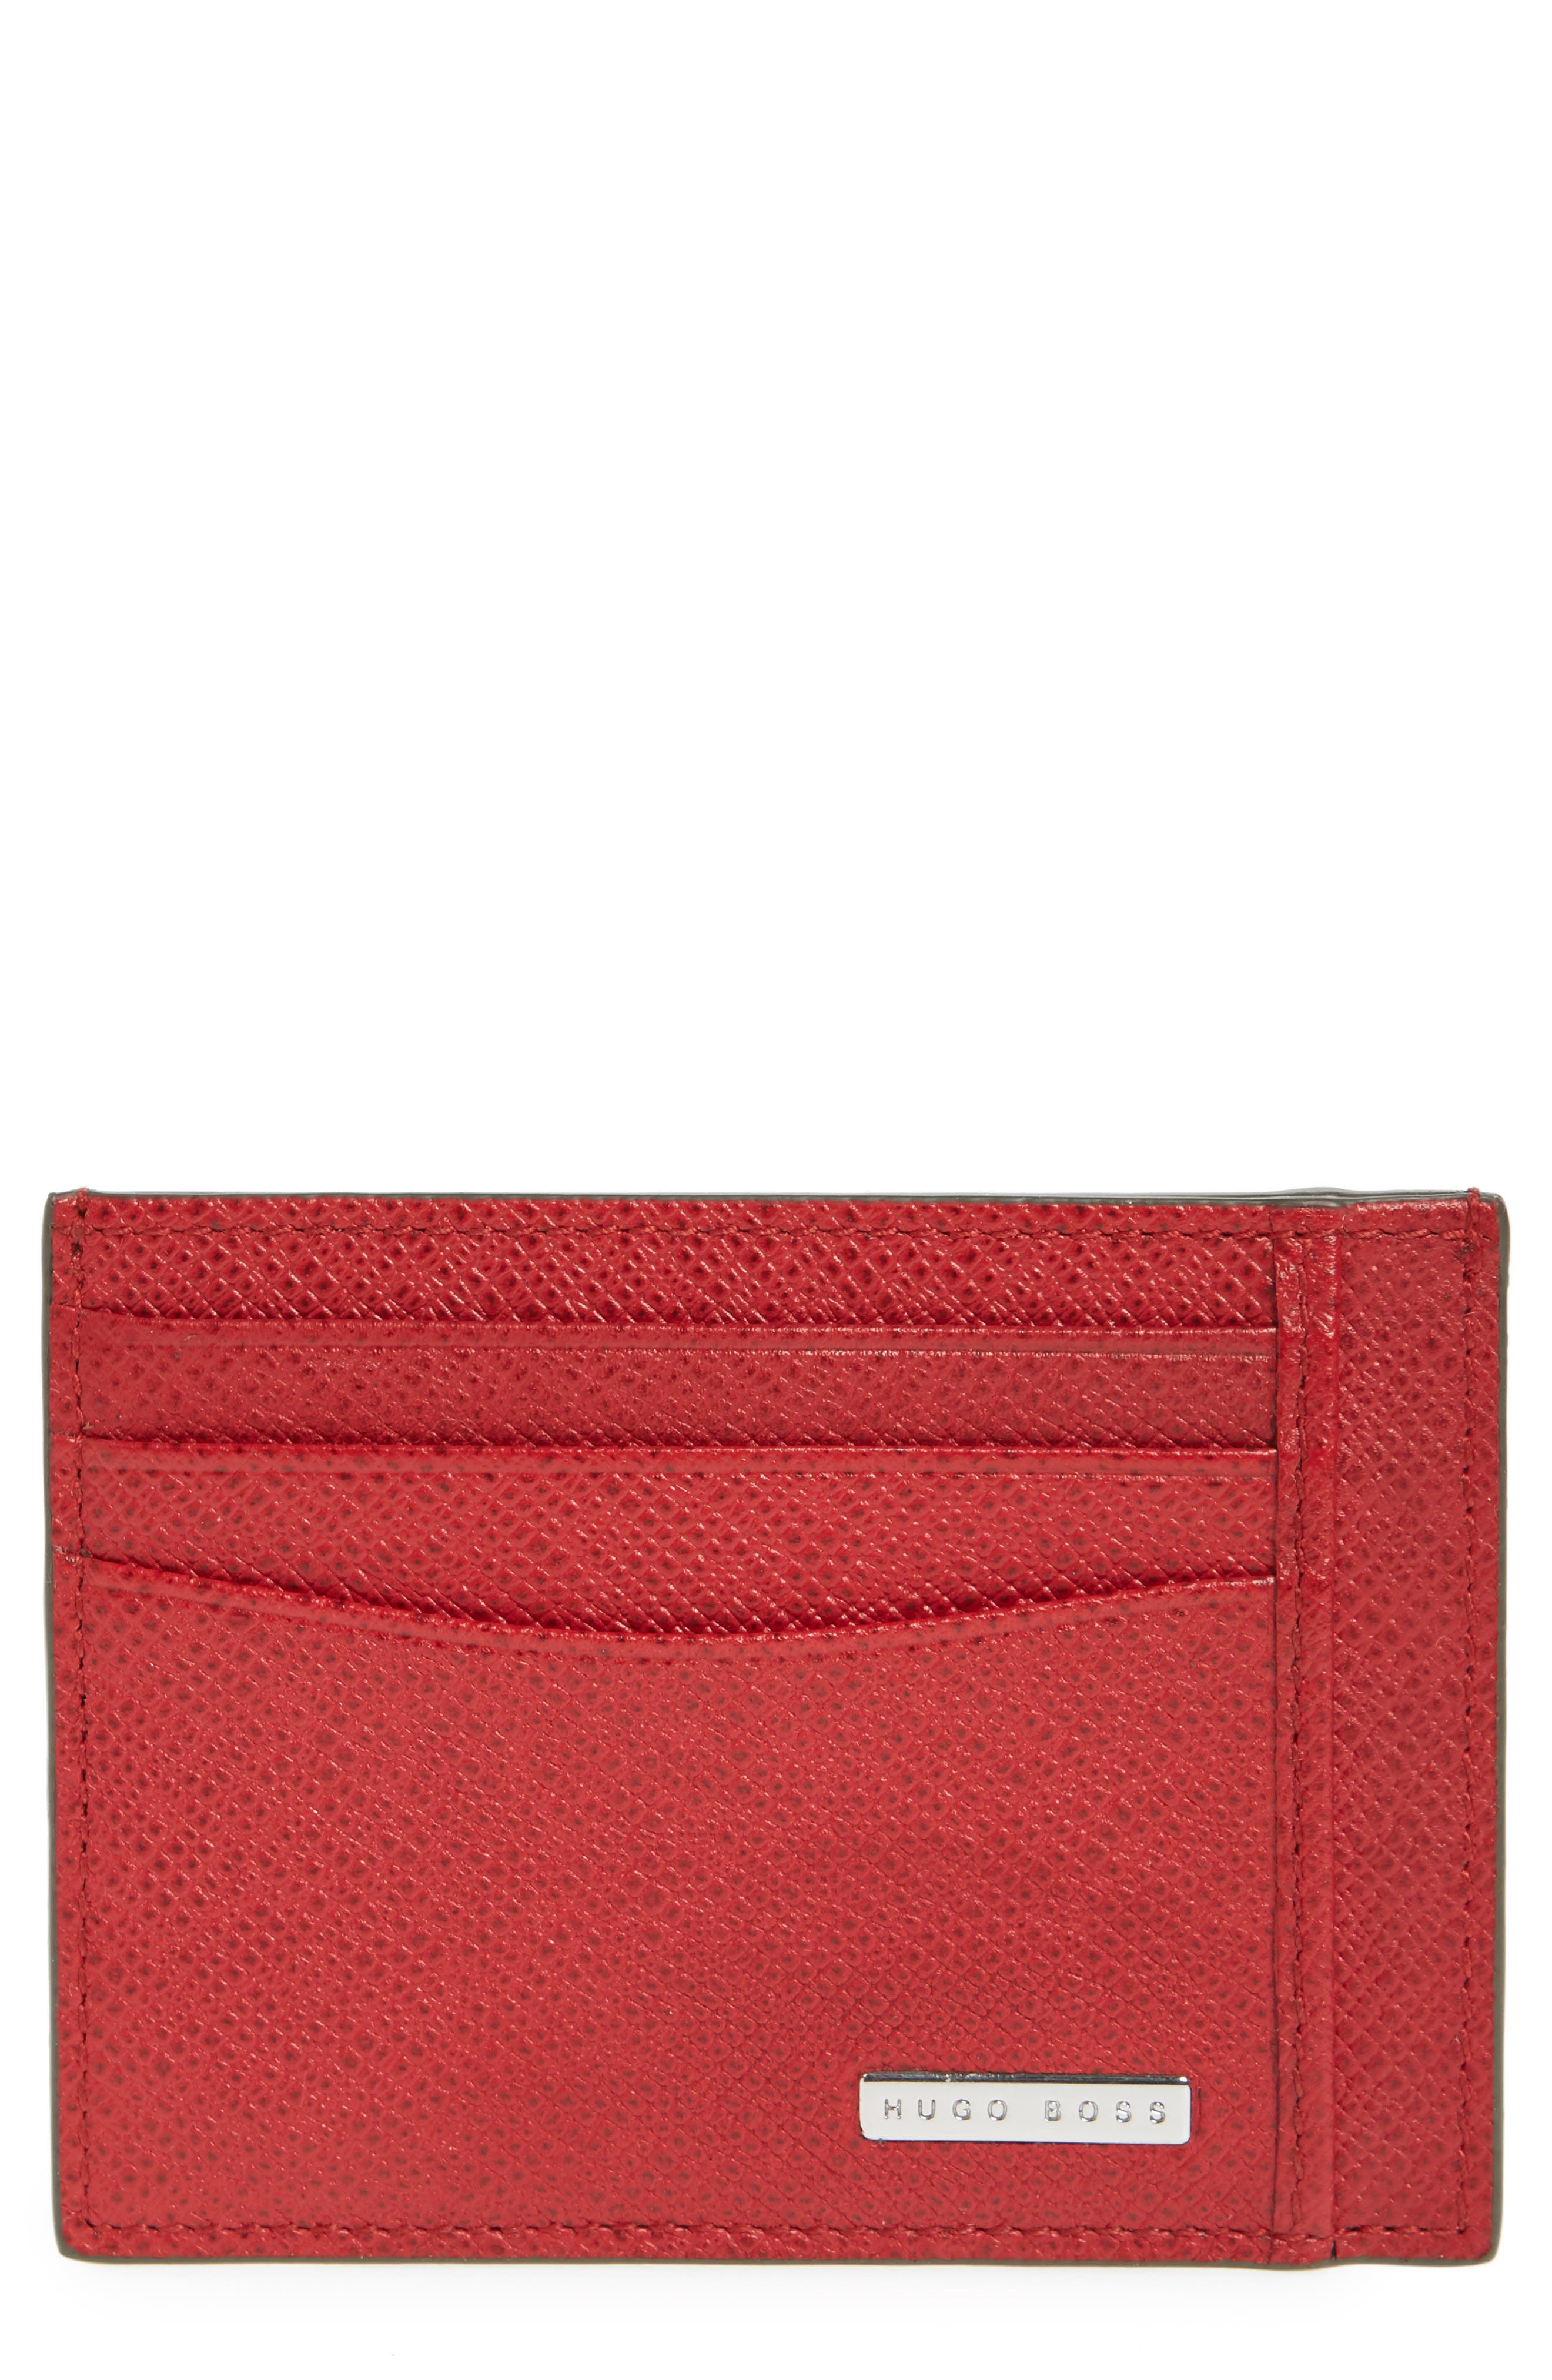 Signature Leather Card Case,                         Main,                         color, Medium Red